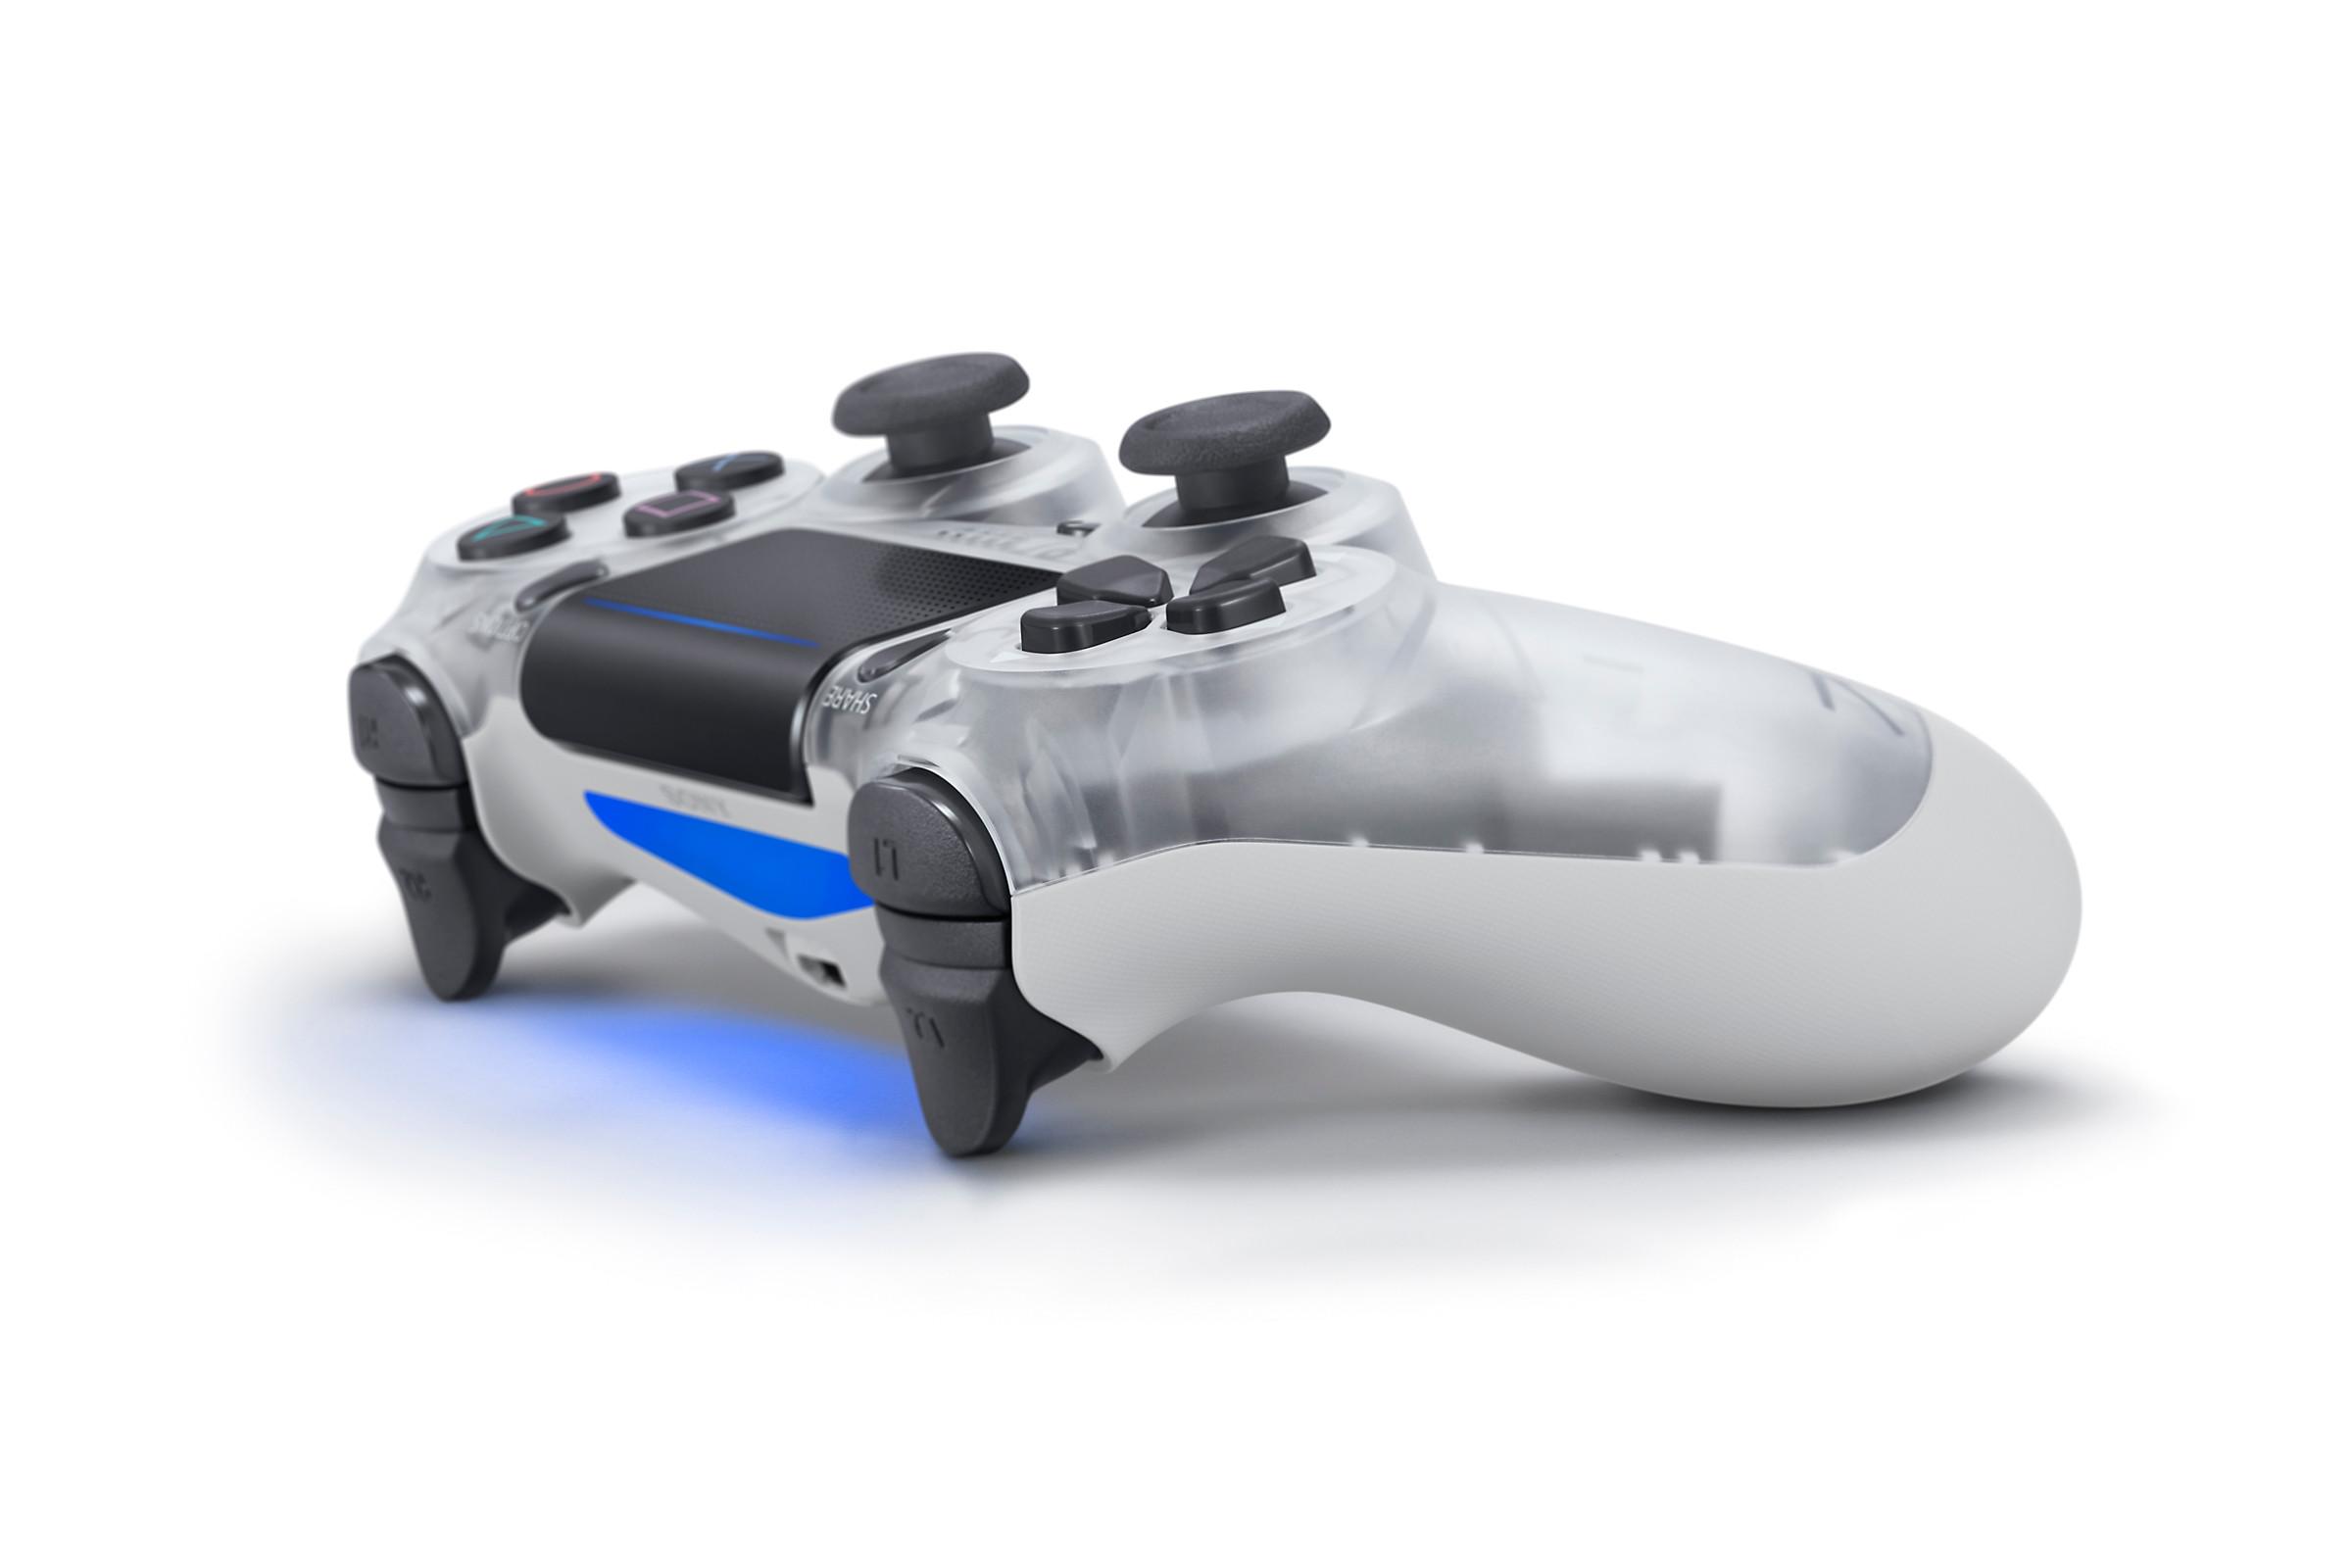 Crystal Dualshock Playstation Cystal Case Ps Vita Buy Now